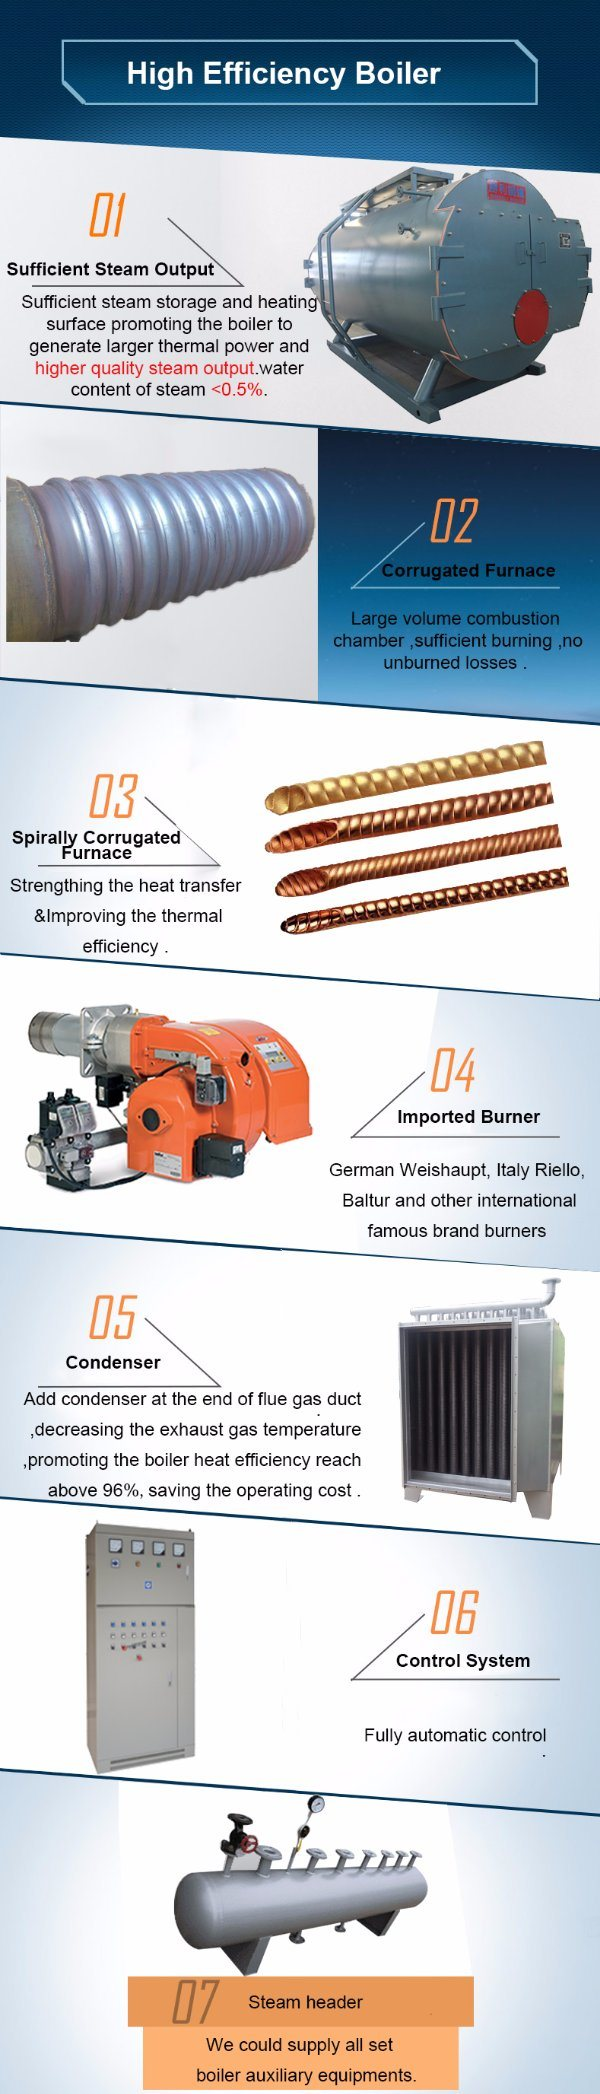 Wonderful high efficiency oil boiler gallery wiring diagram ideas china high efficiency industrial water tube oil boiler china cheapraybanclubmaster Gallery